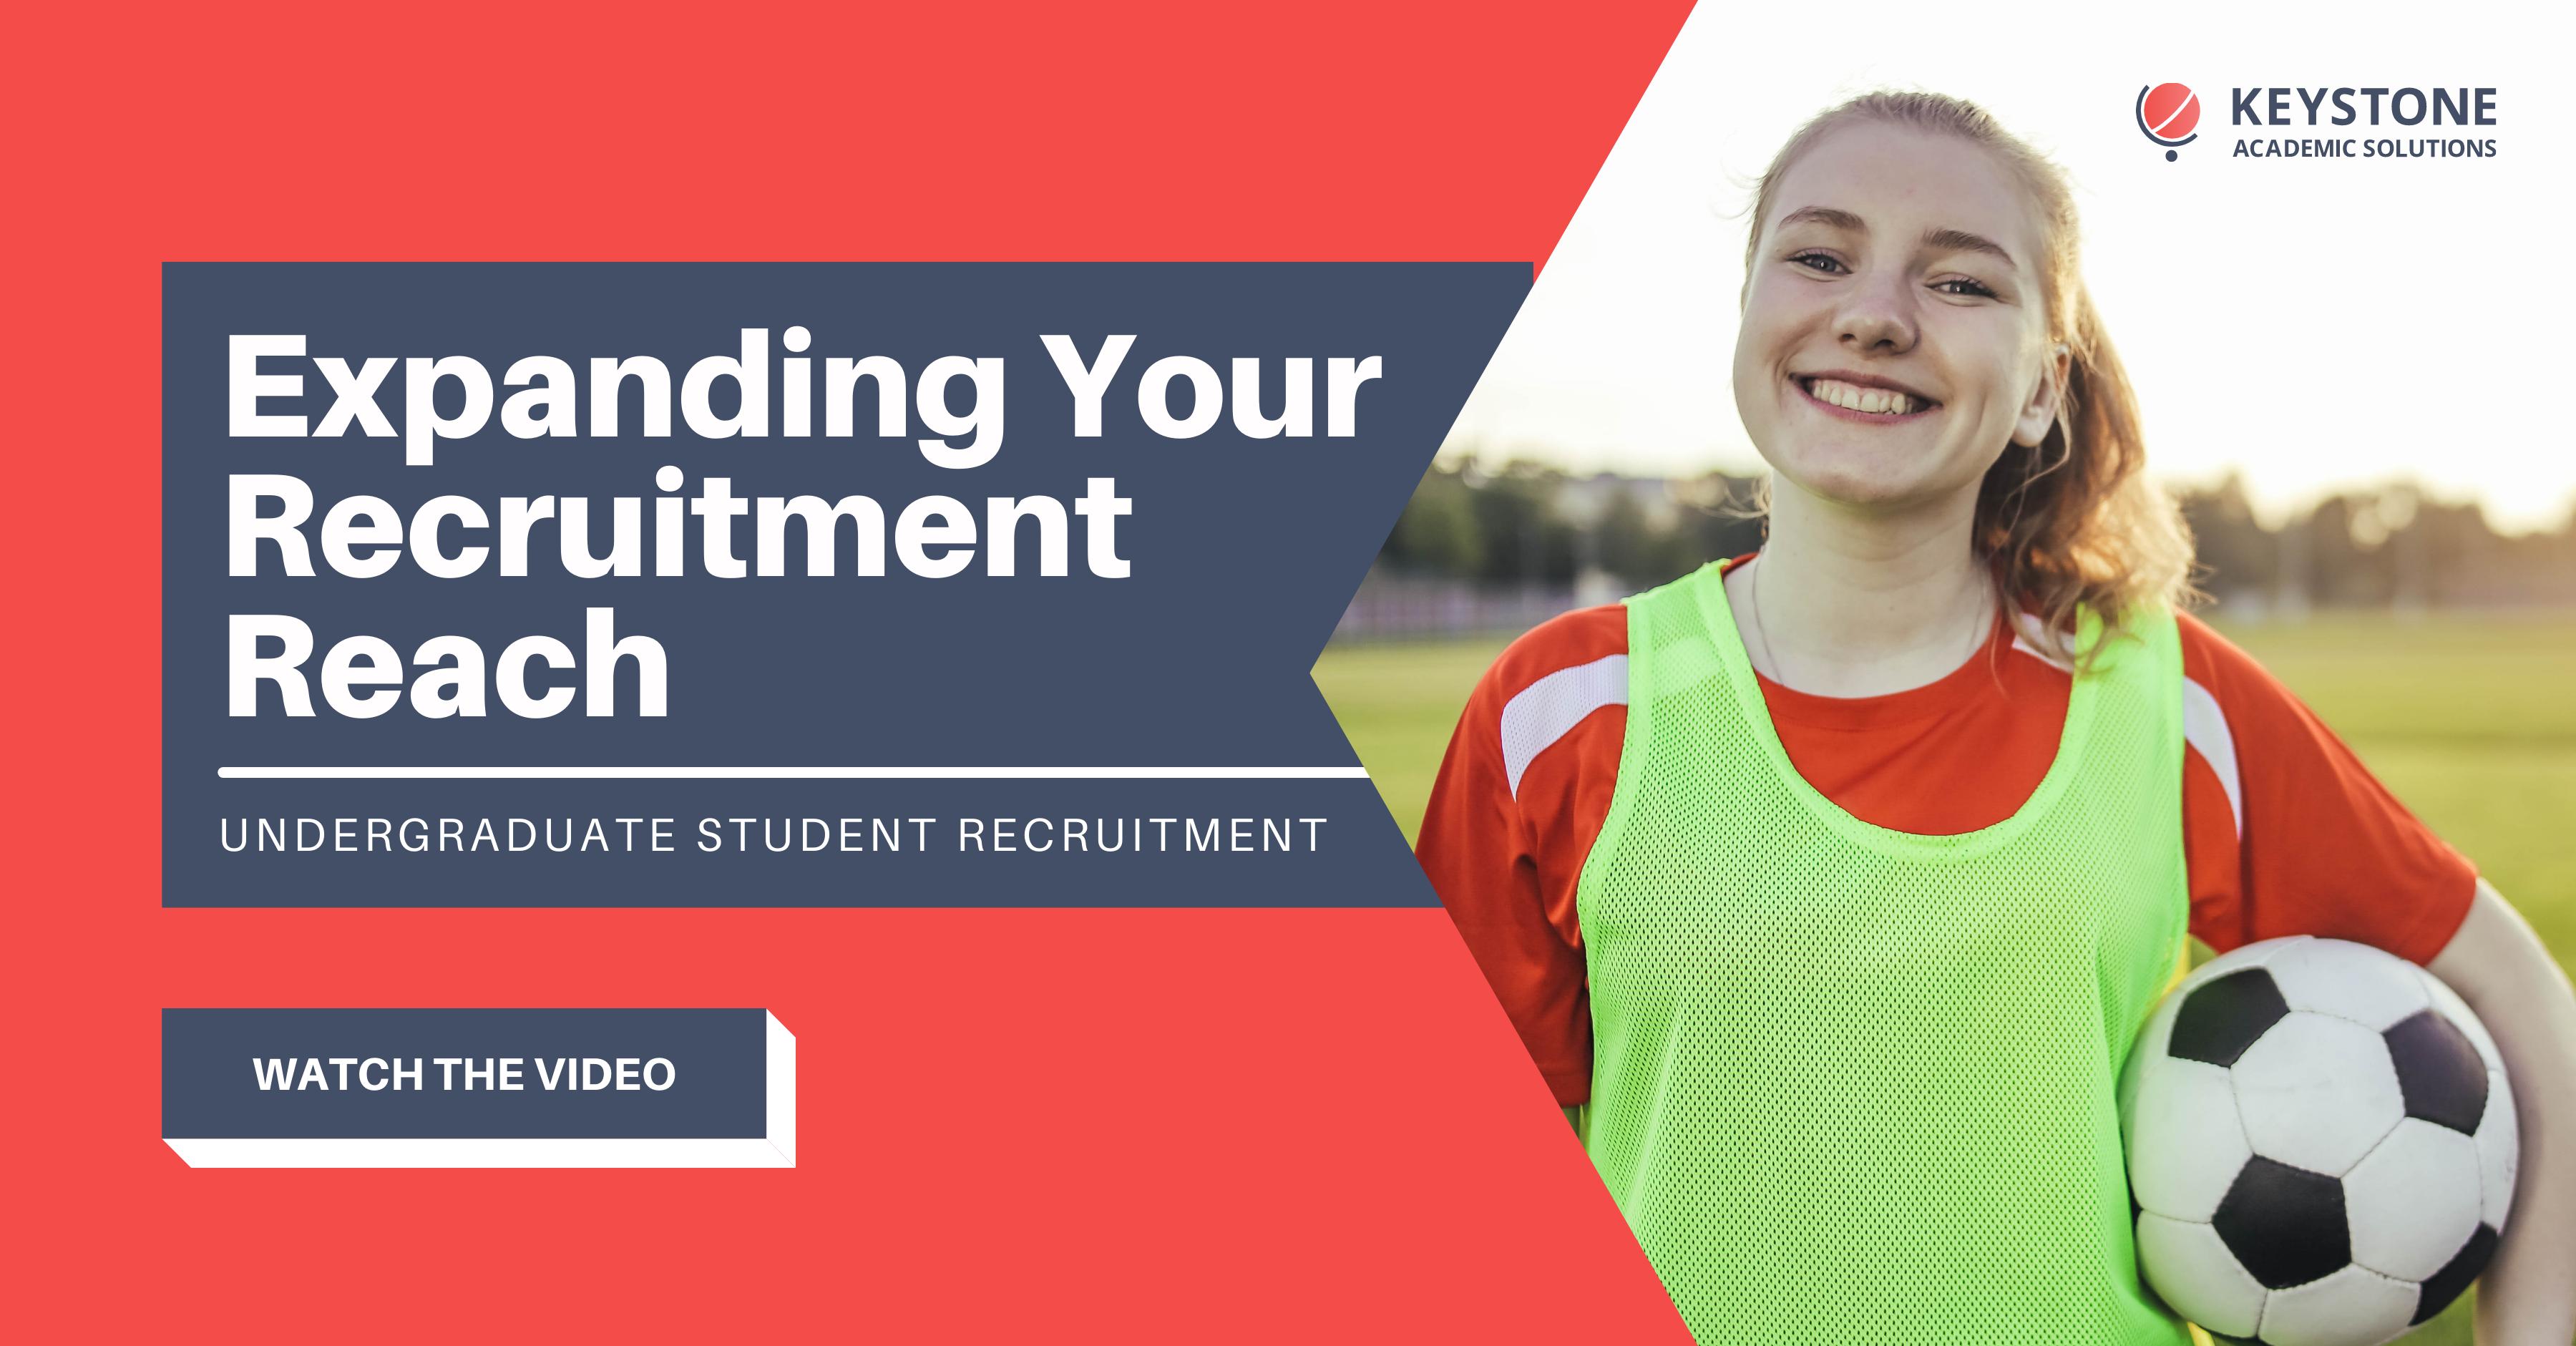 Undergraduate Student Recruitment (WEBINAR)